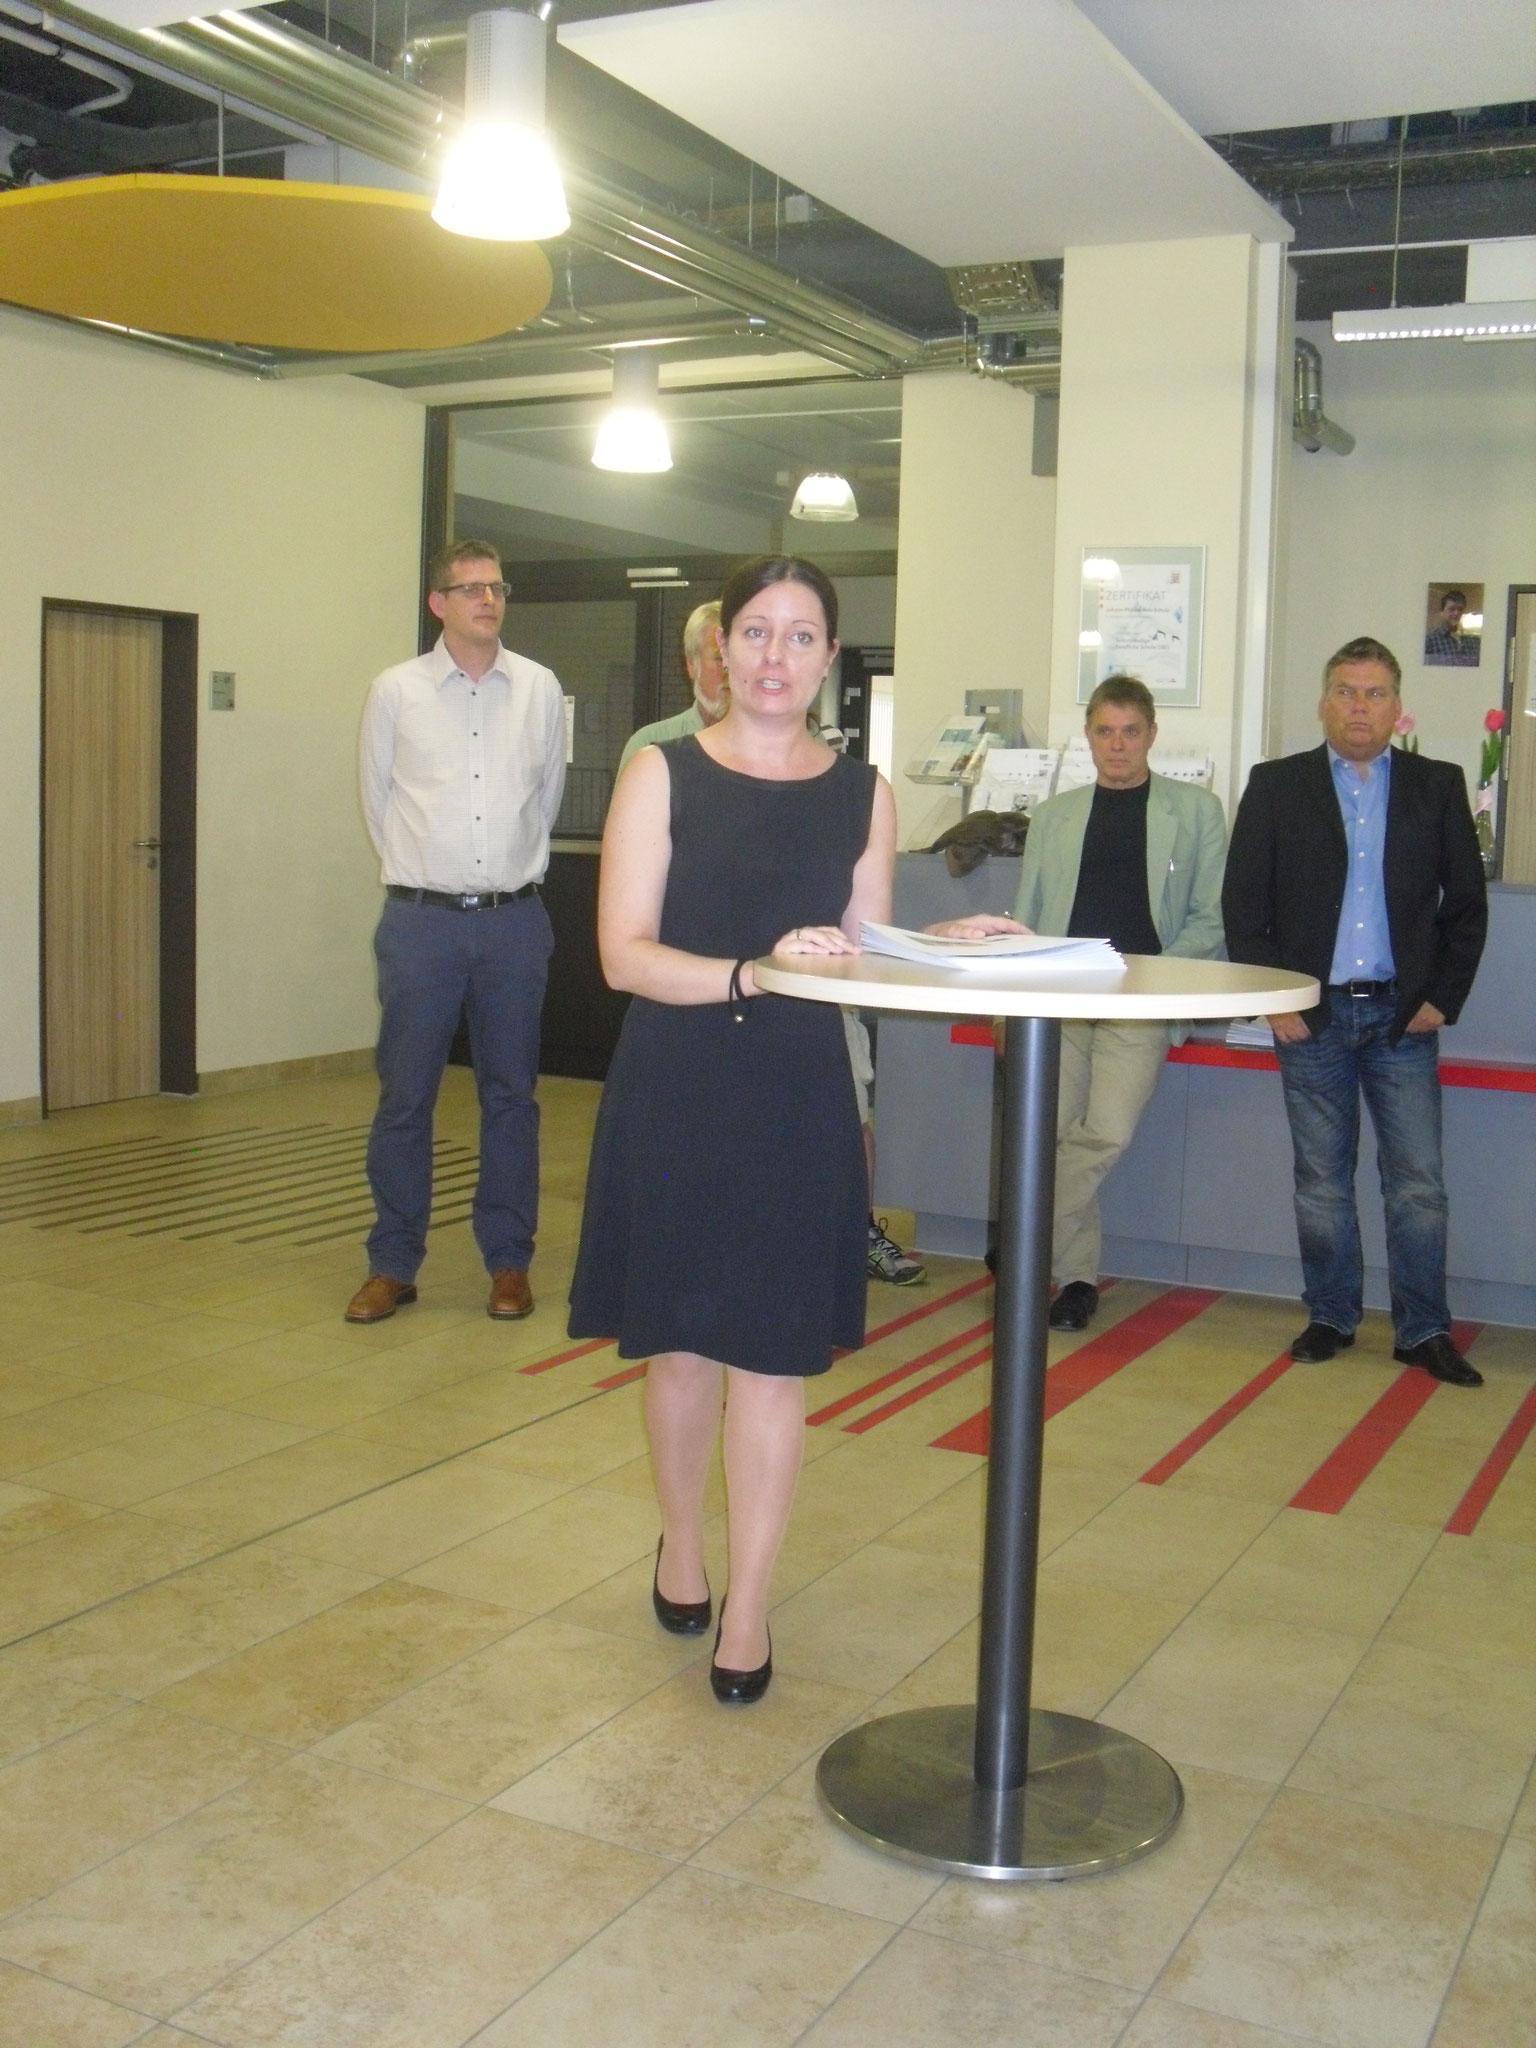 Nathalie Reinke, Klassenlehrerin BF2C